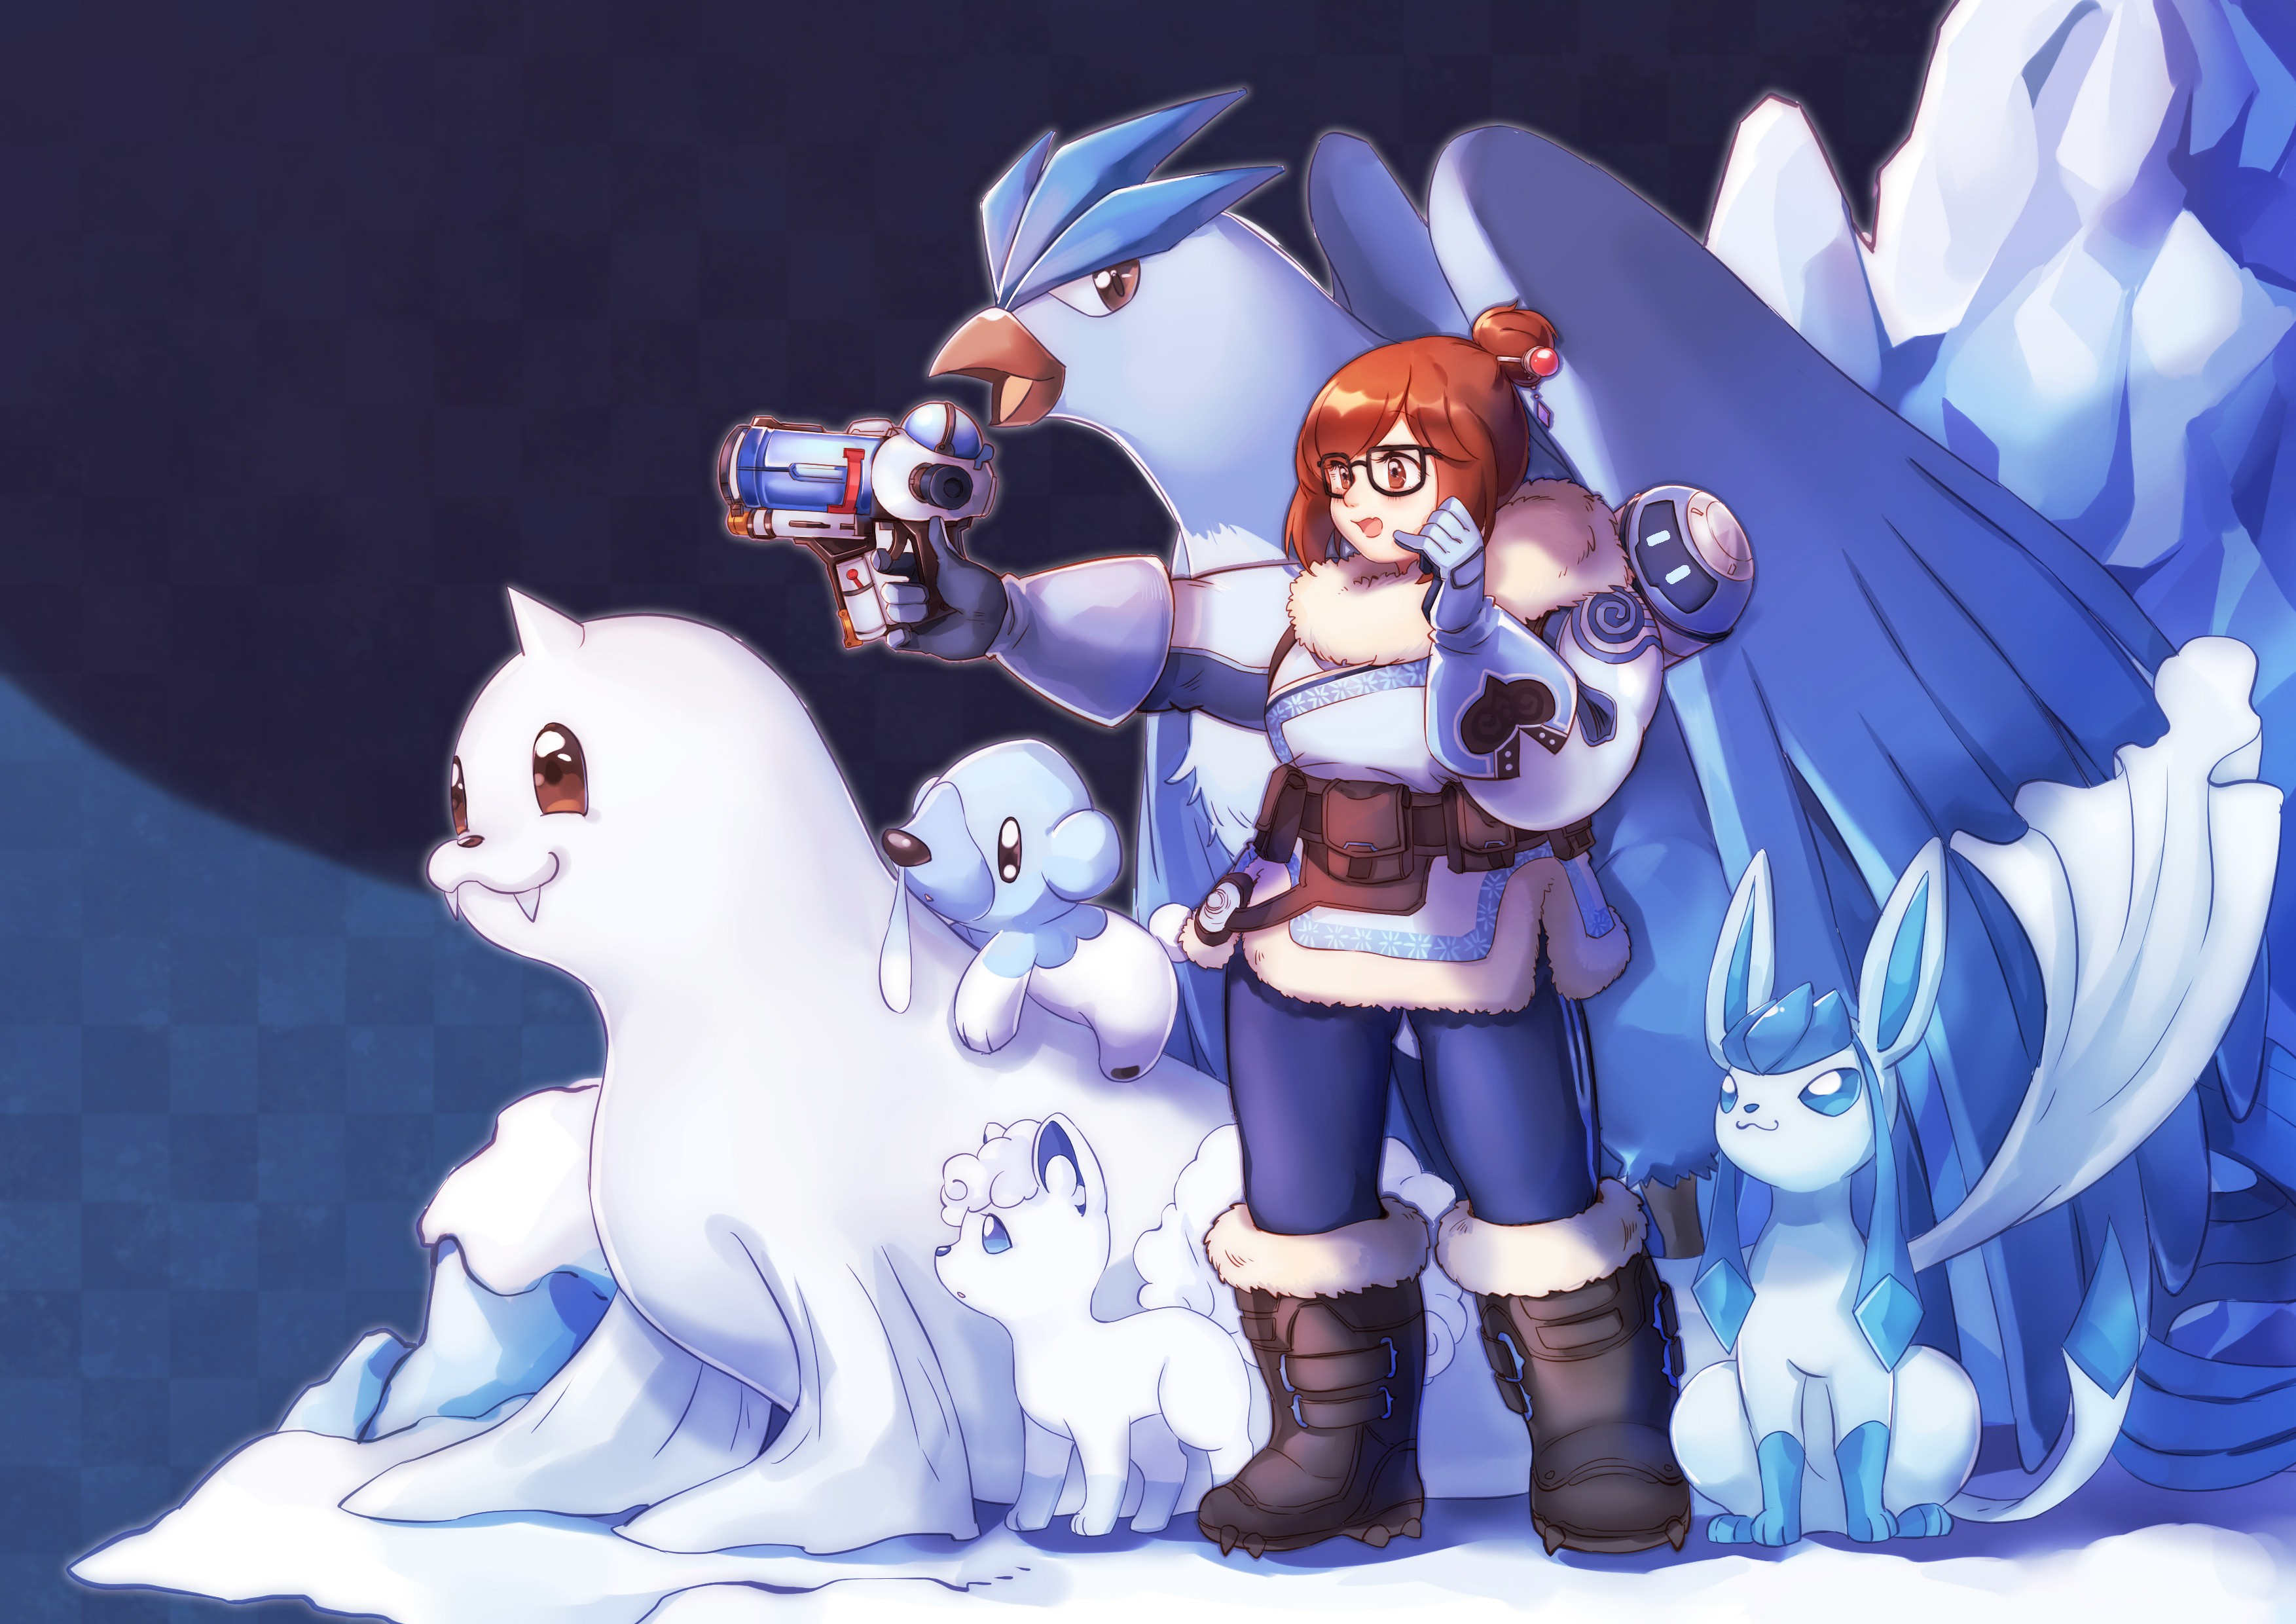 Cute Vulpix Pokemon Wallpaper Crossover Hd Wallpaper Background Image 3507x2480 Id